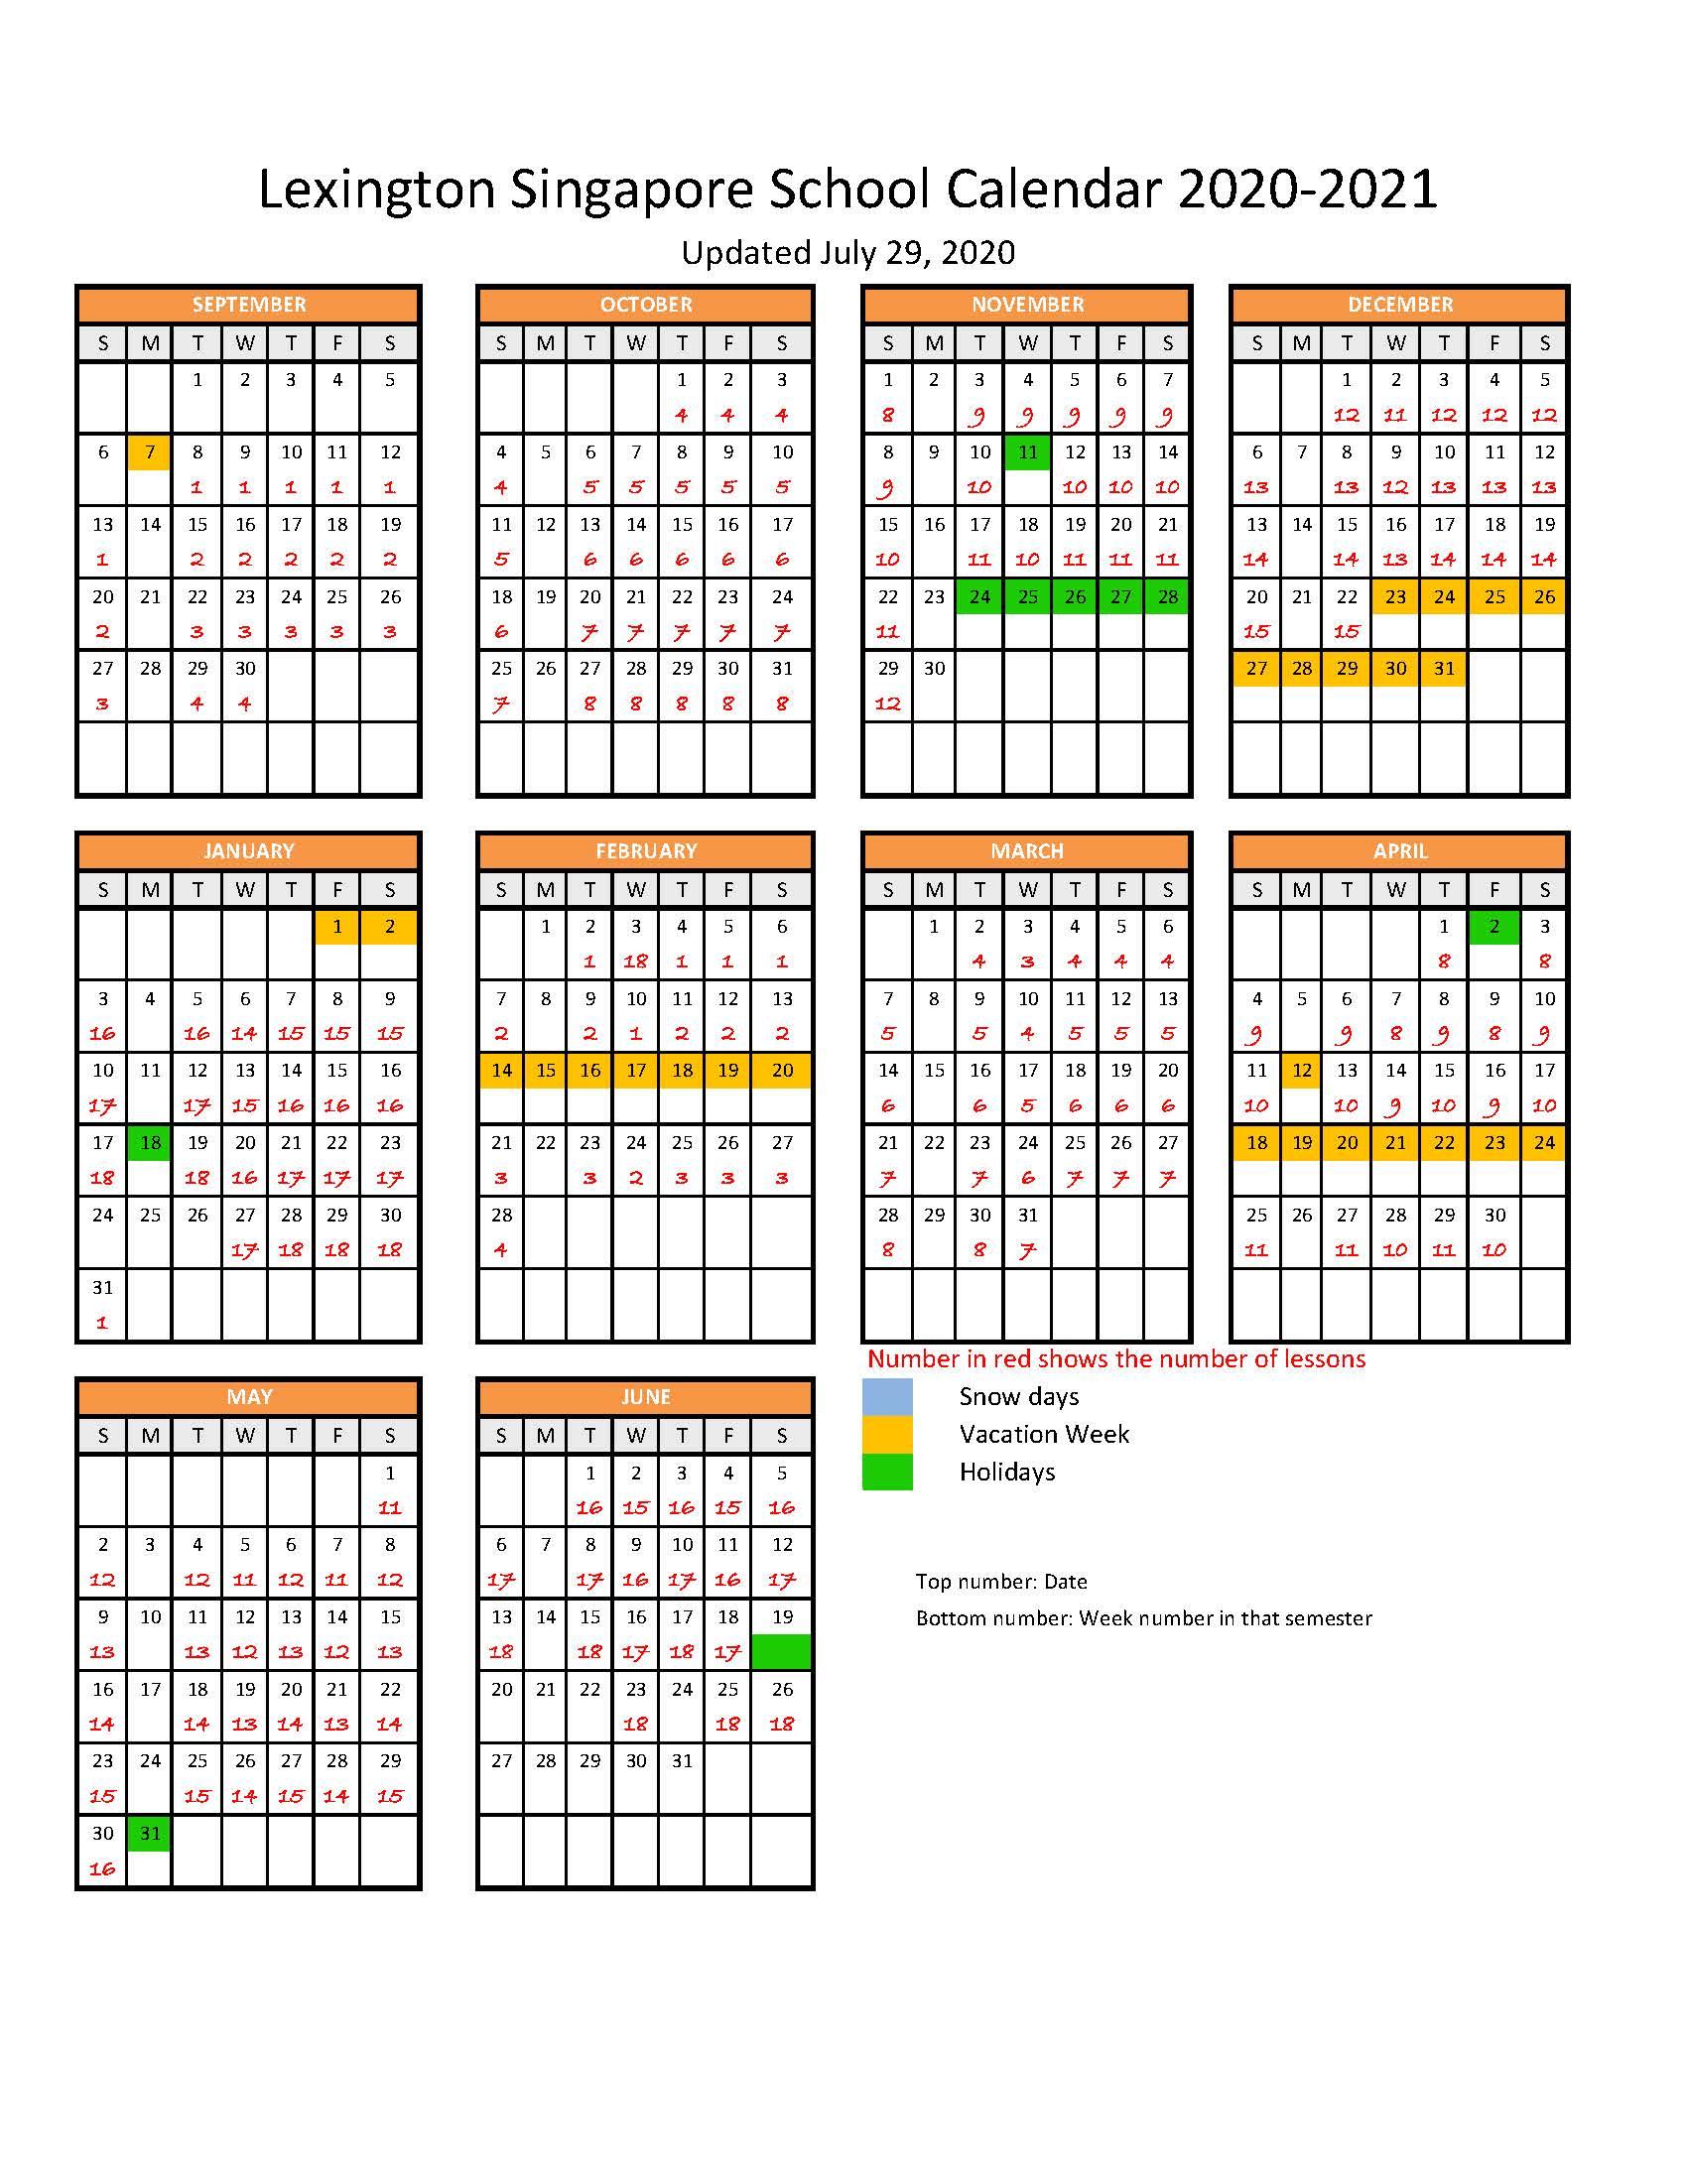 calendar_2020-2021 - Lexington Singapore School